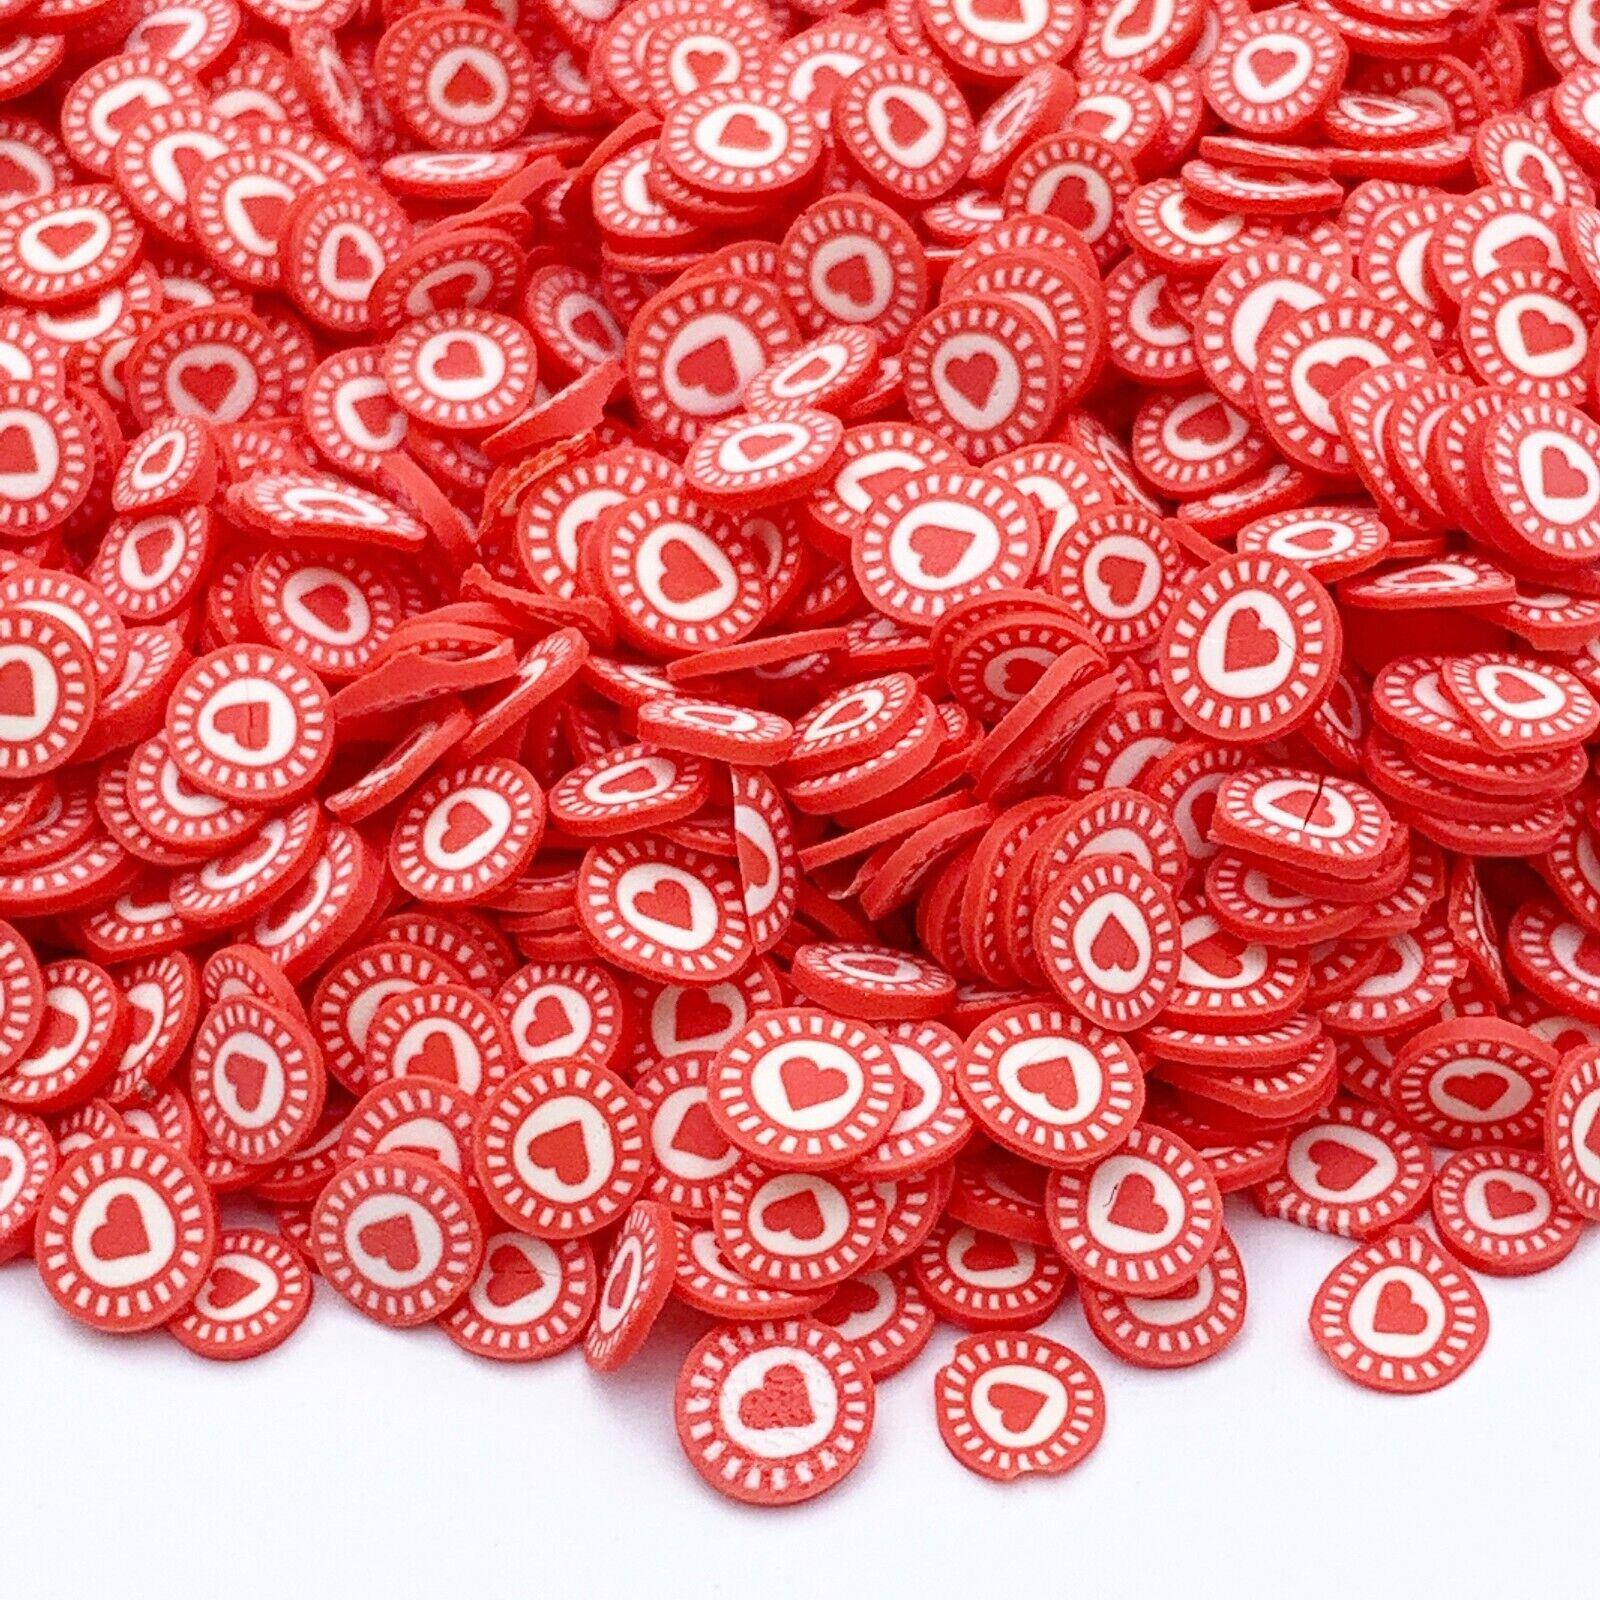 Polymer Clay Heart Sprinkles, Valentines Fake Sprinkles, Decoden Funfetti Jimmie - $1.75